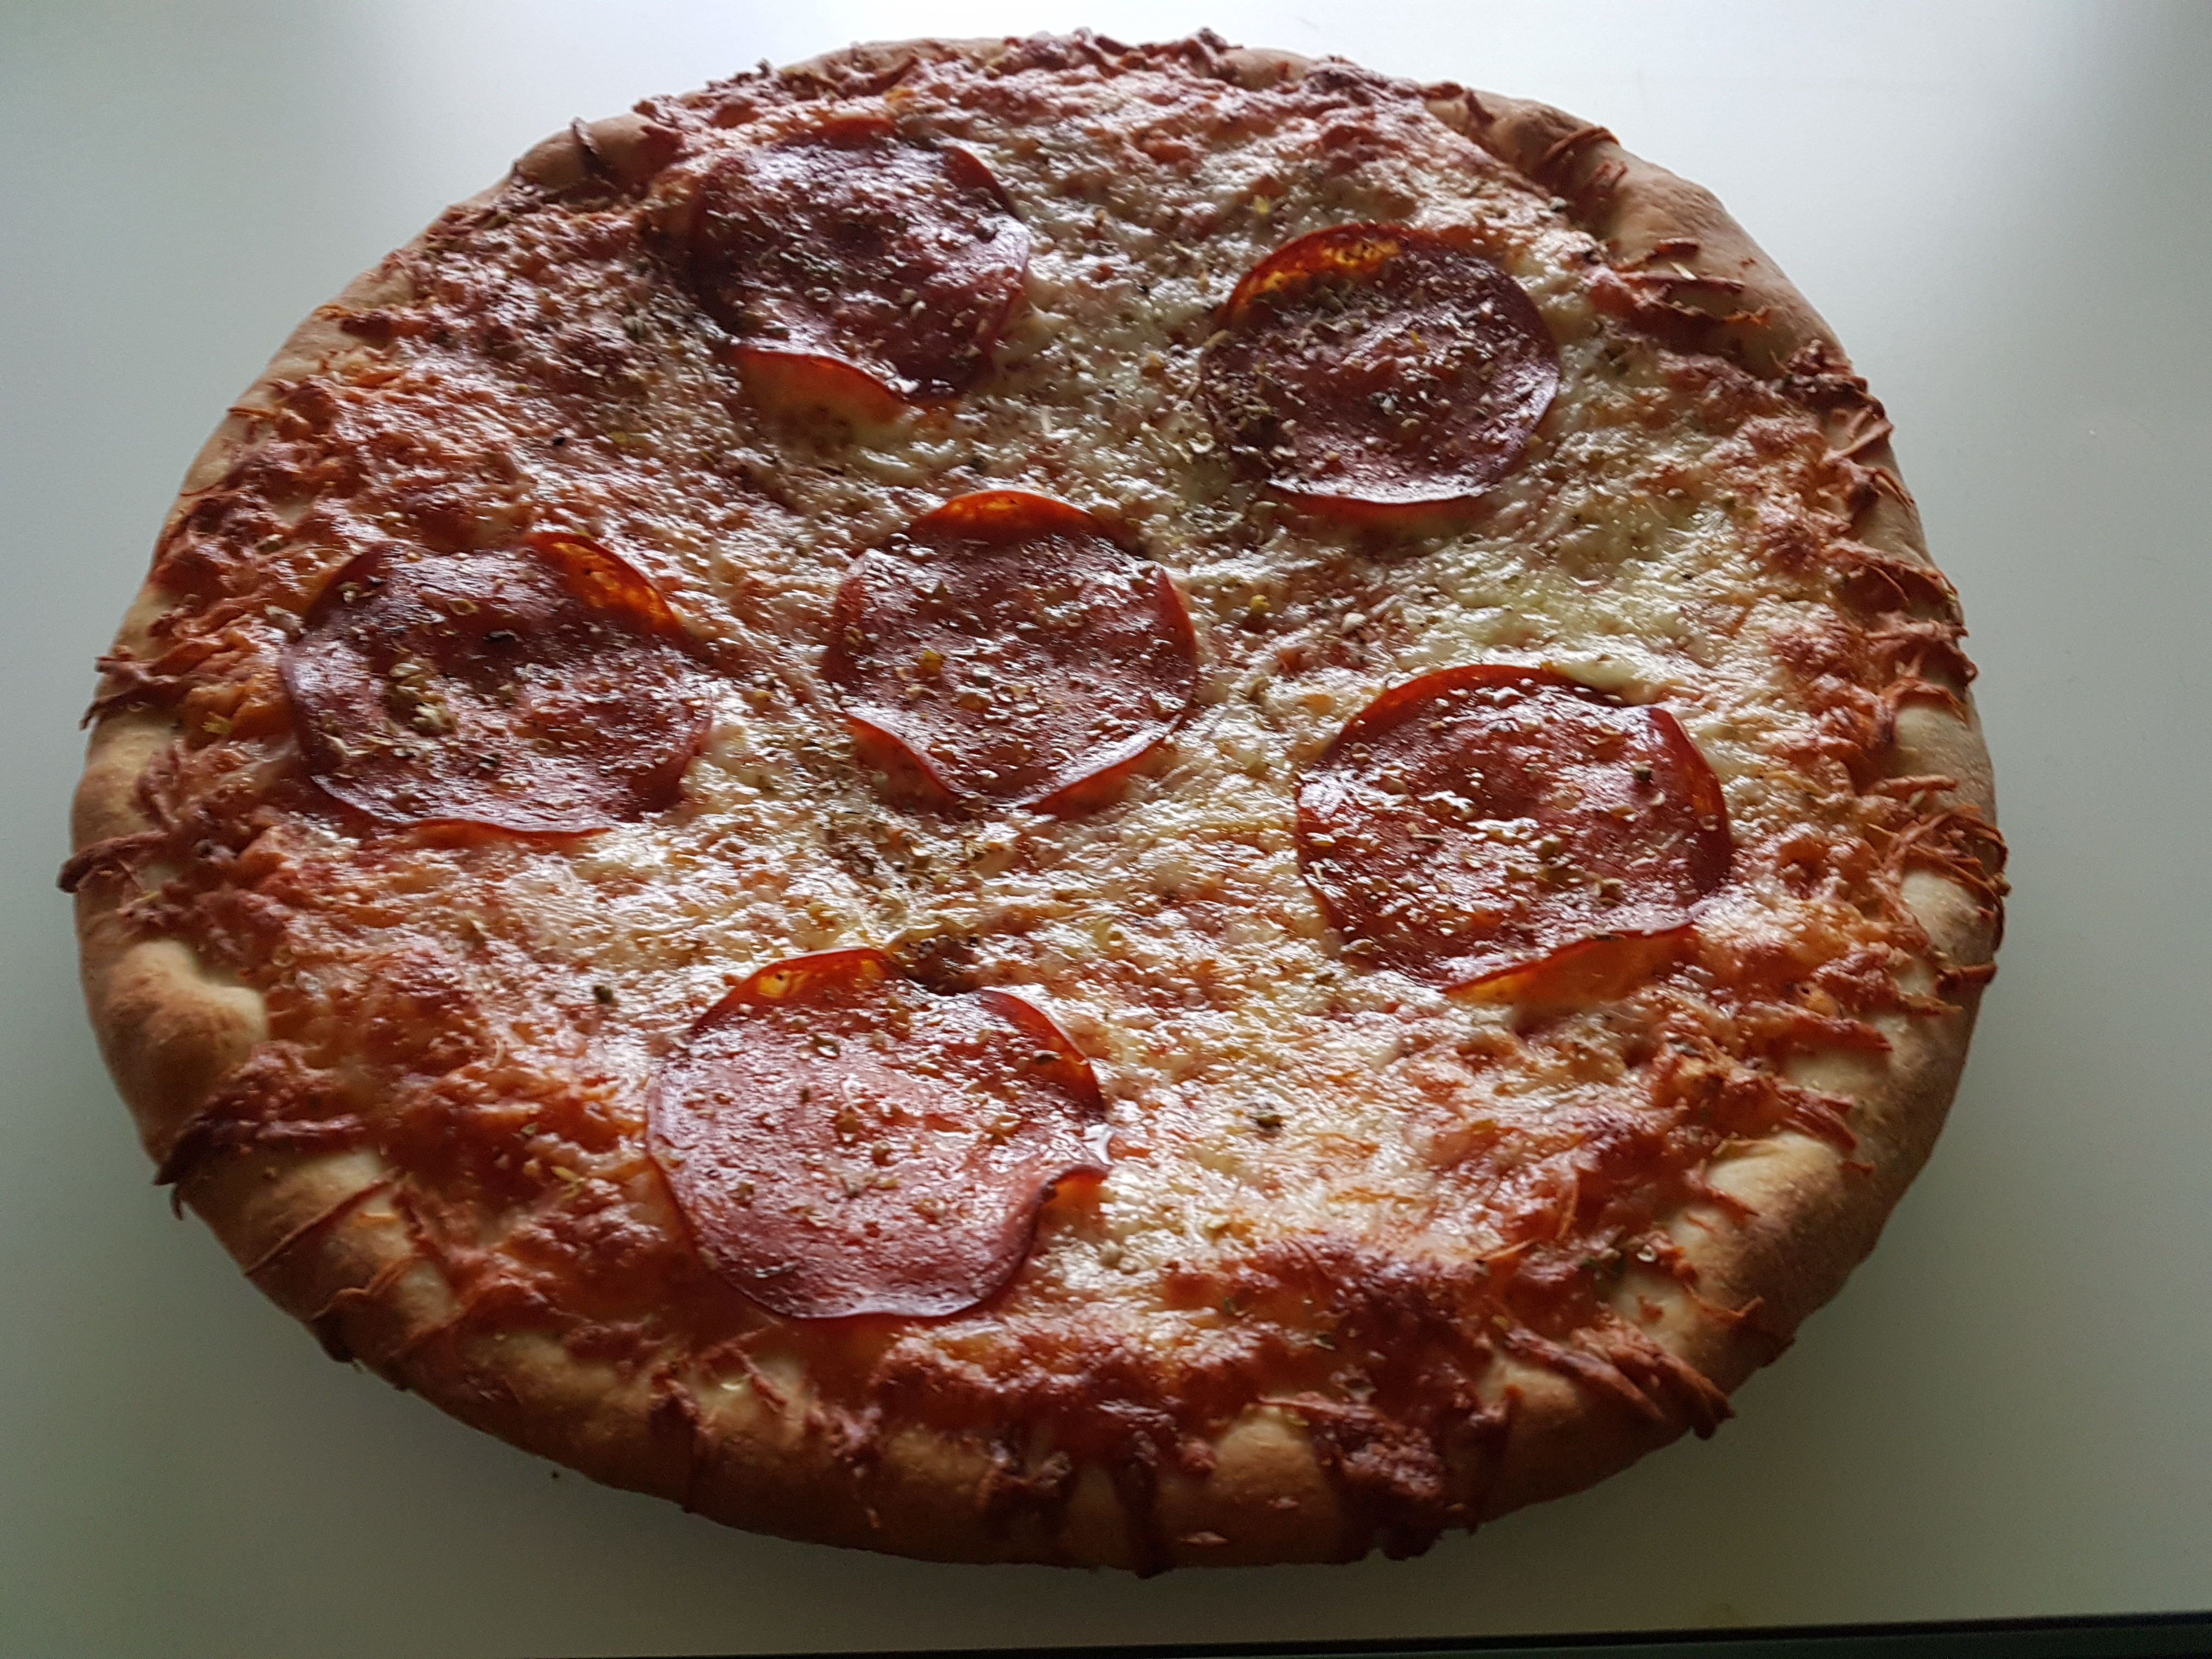 http://foodloader.net/Holz_2018-11-04_Pizza.jpg